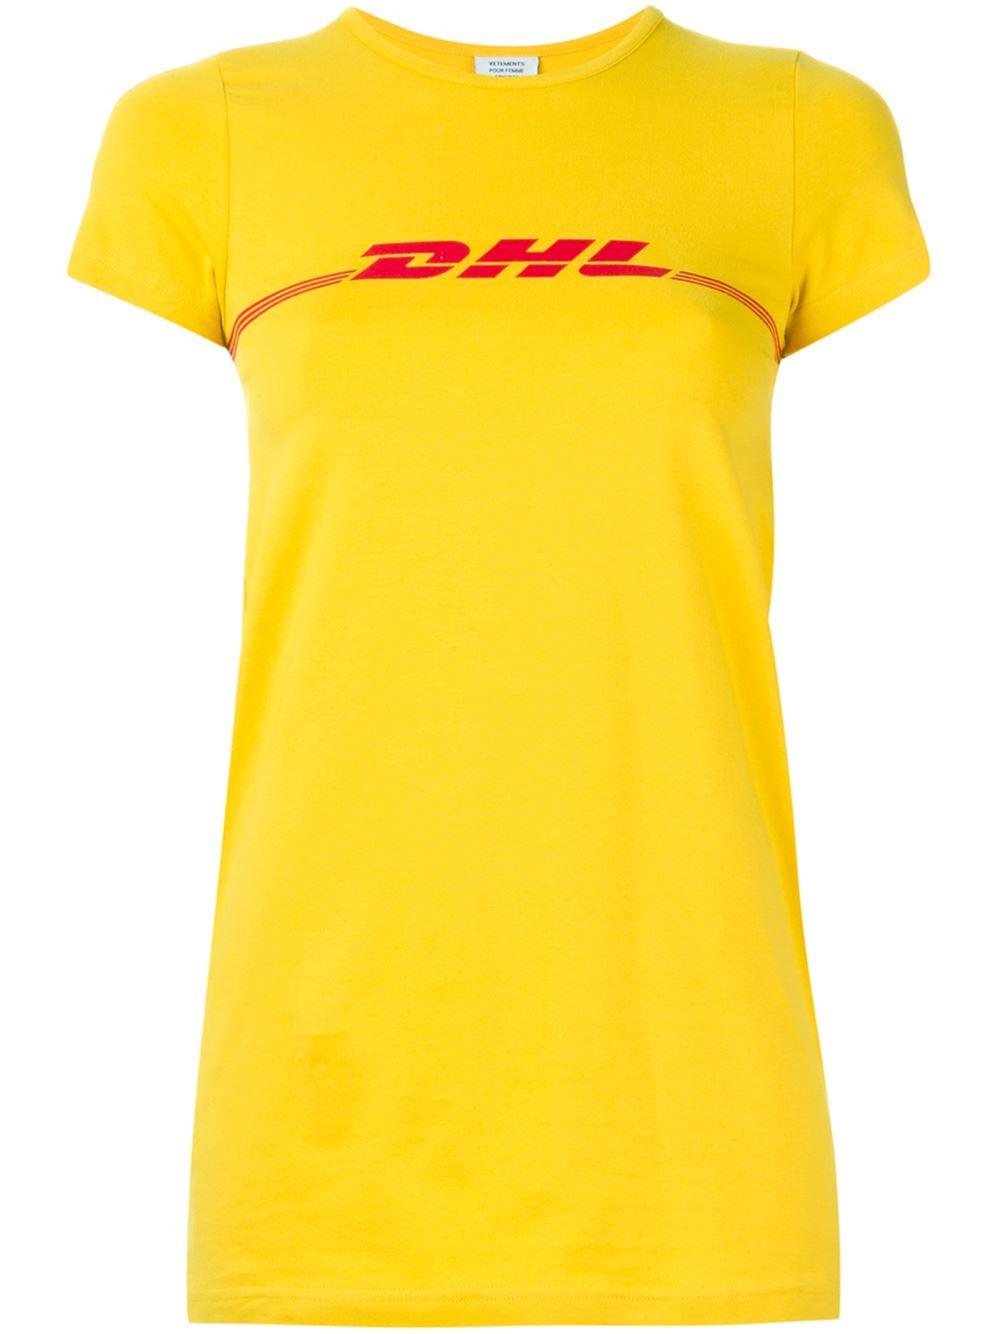 Vetements Yellow T Shirt In Yellow For Men Lyst